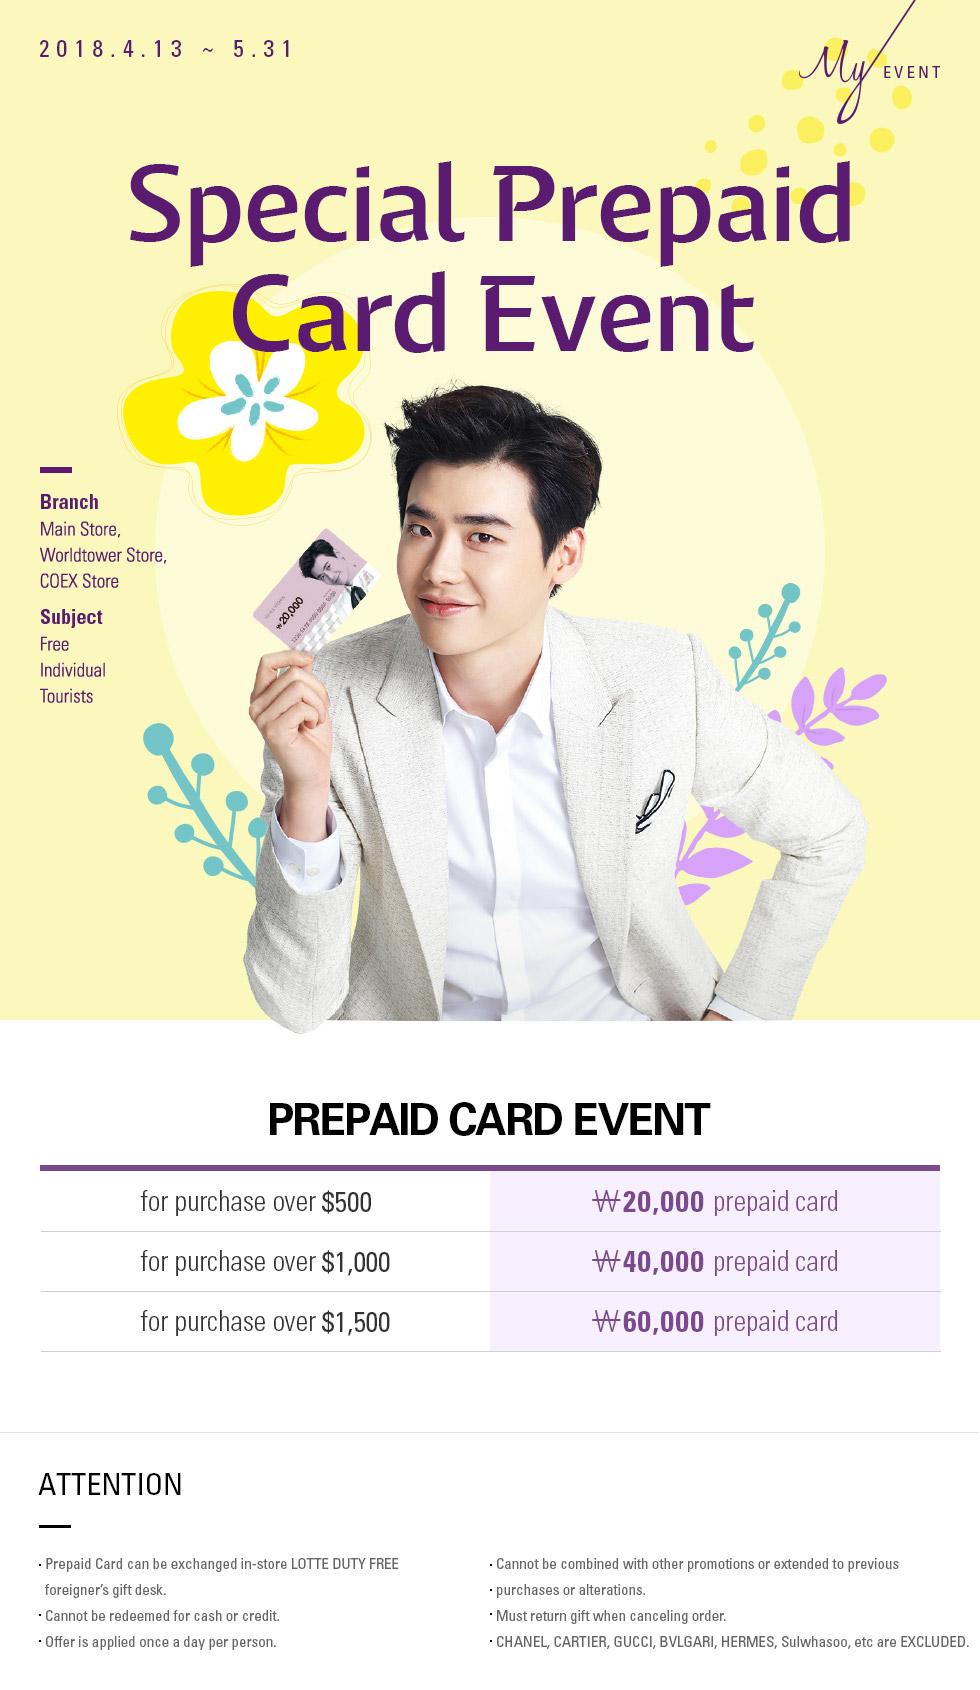 Special Prepaid Card Event